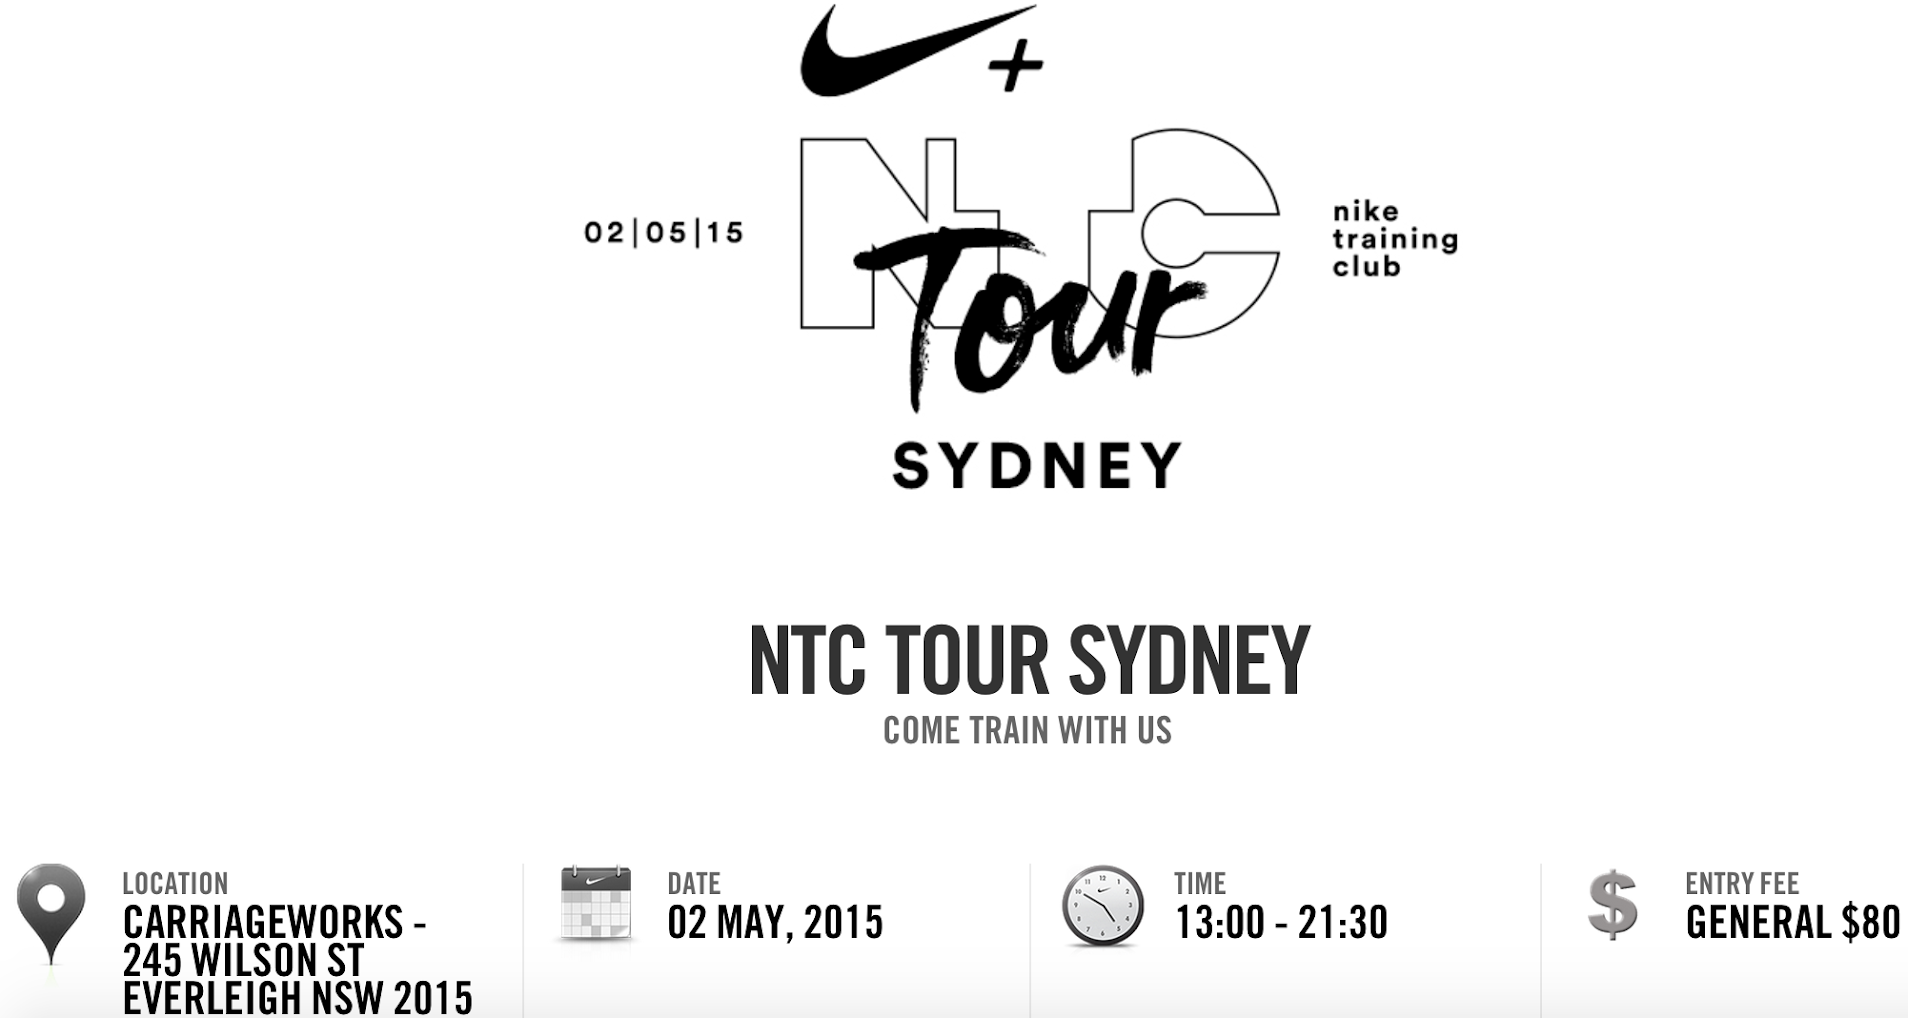 NTC Tour Sydney